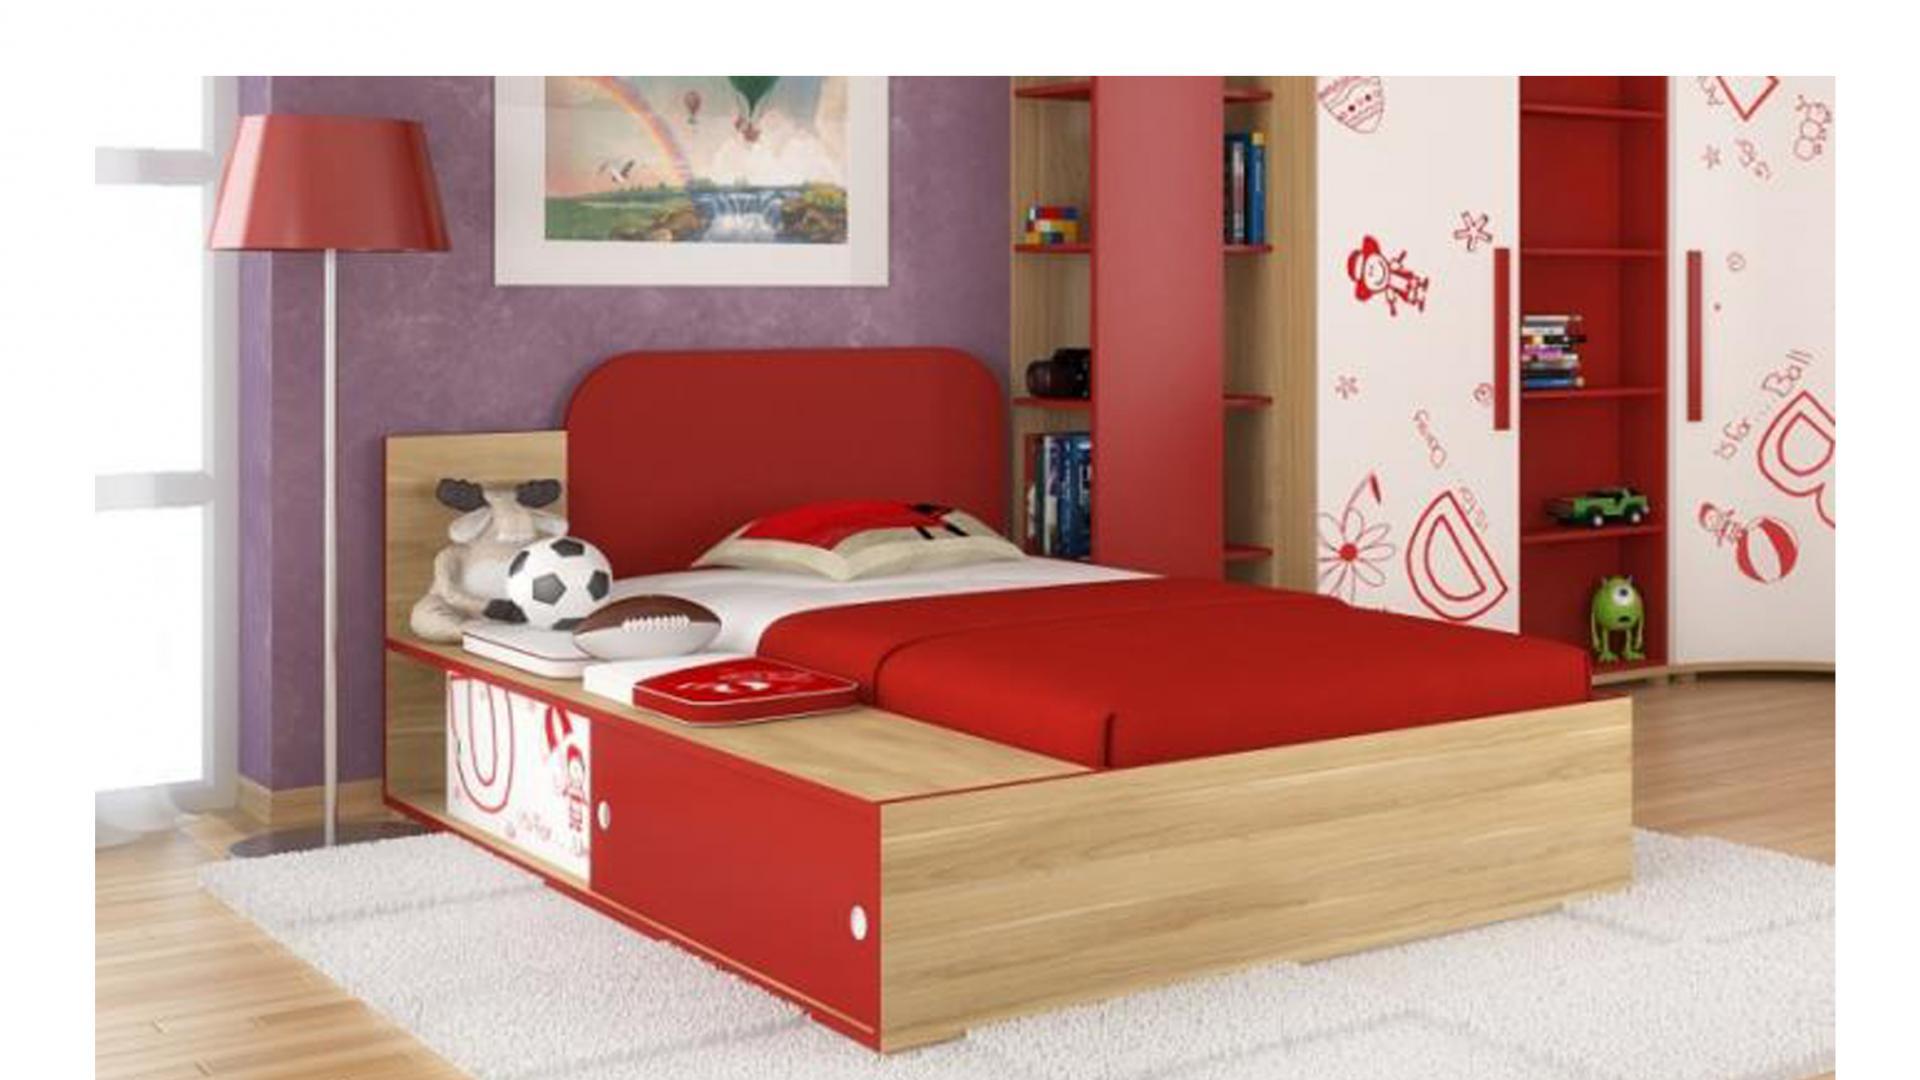 Кровать+Подушки Алфавит Лд 506.010